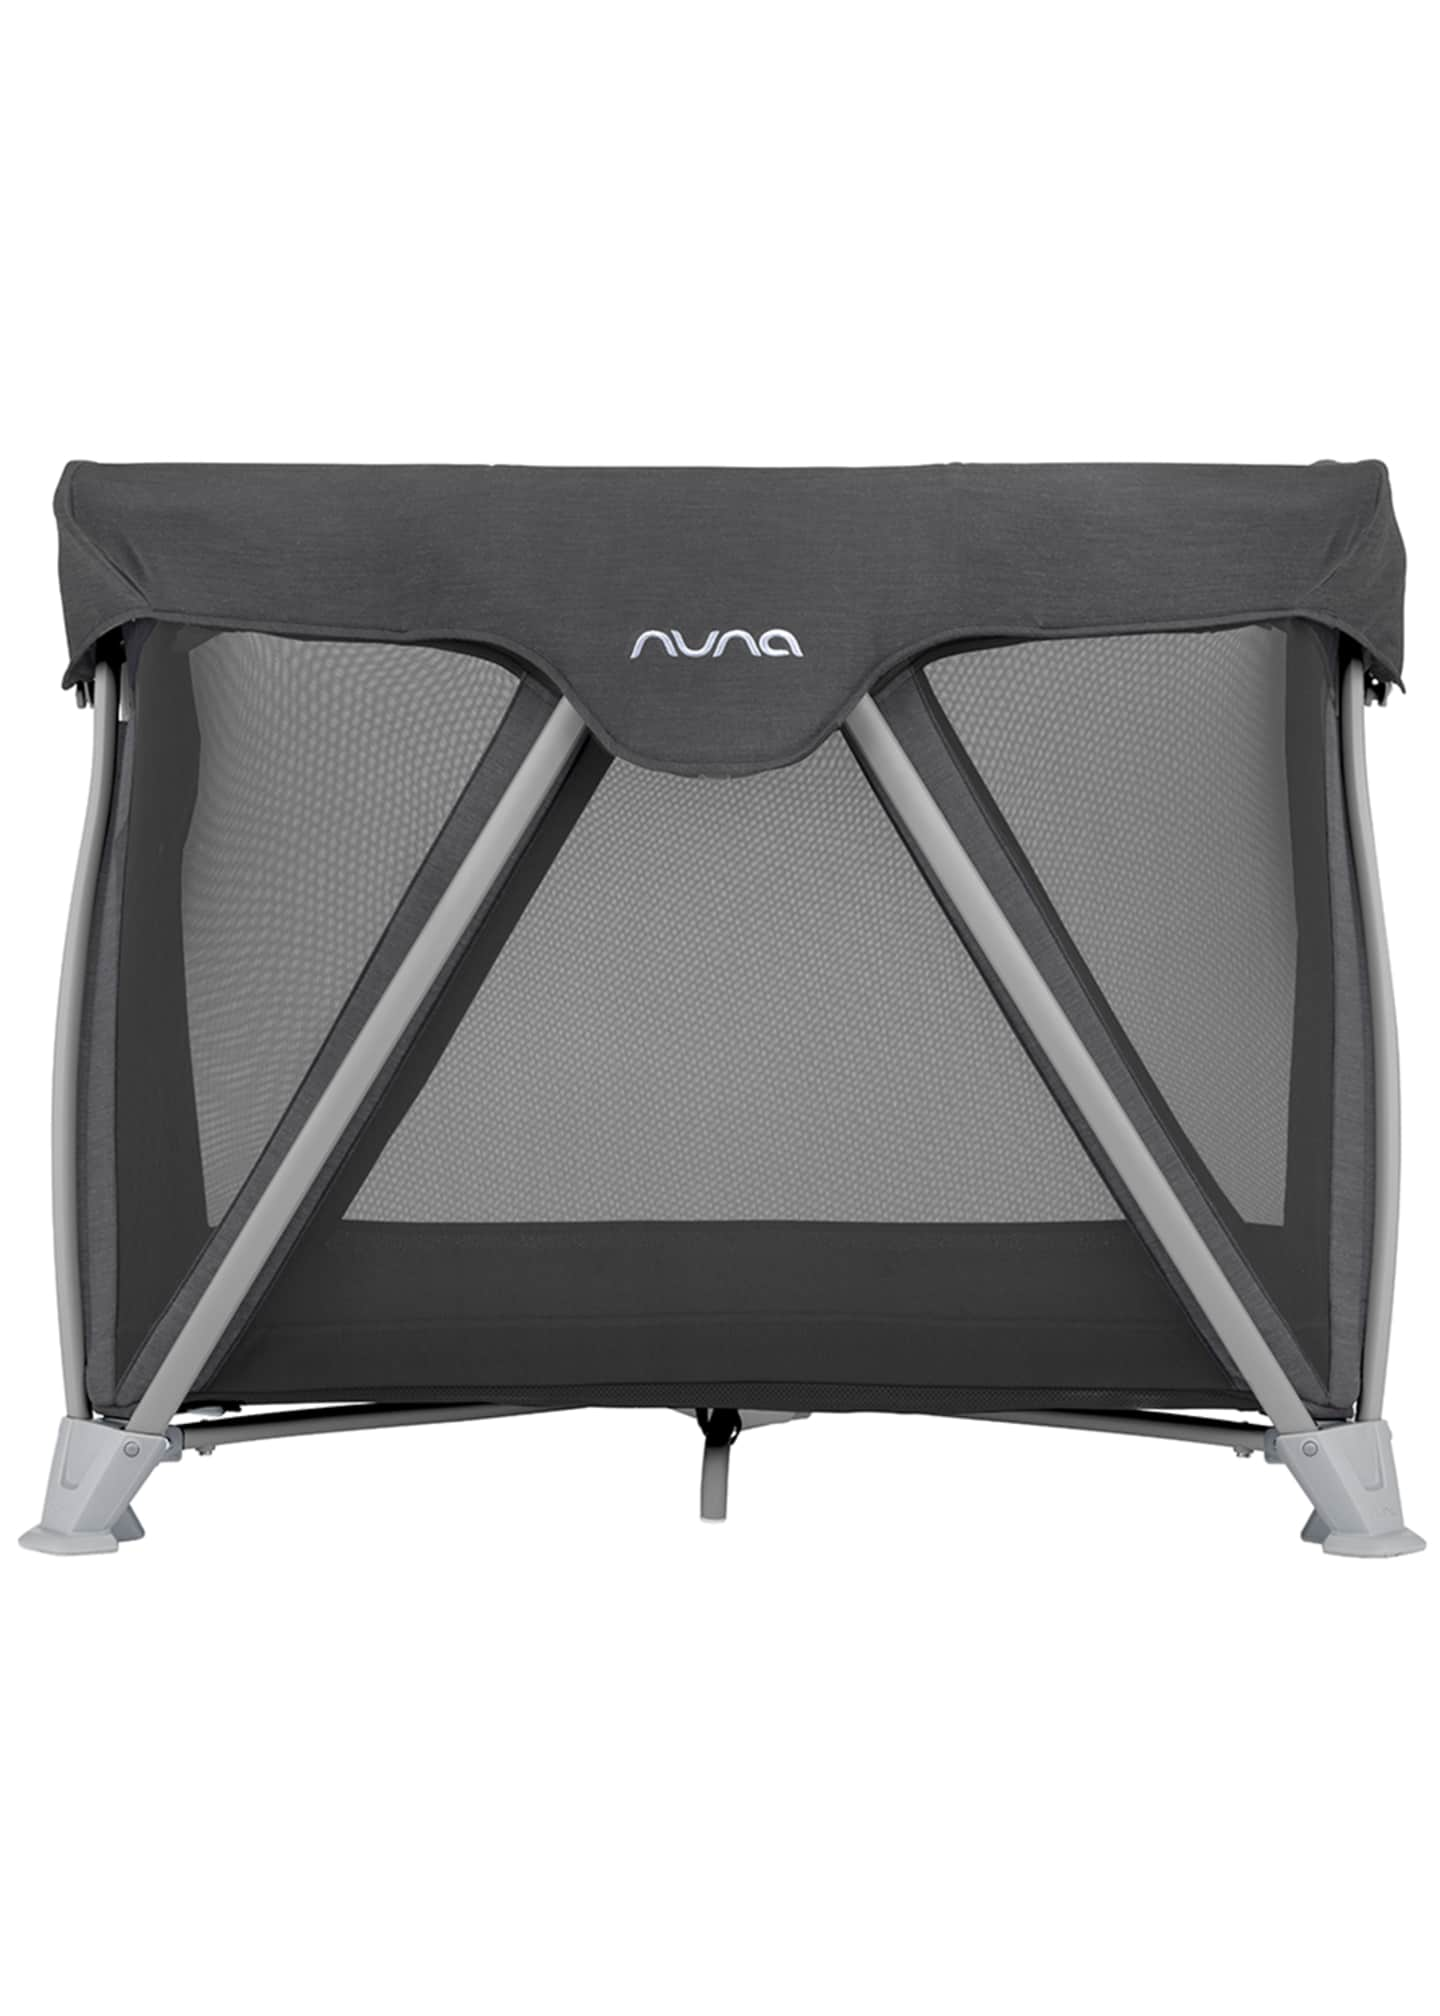 Nuna COVE Aire Playard